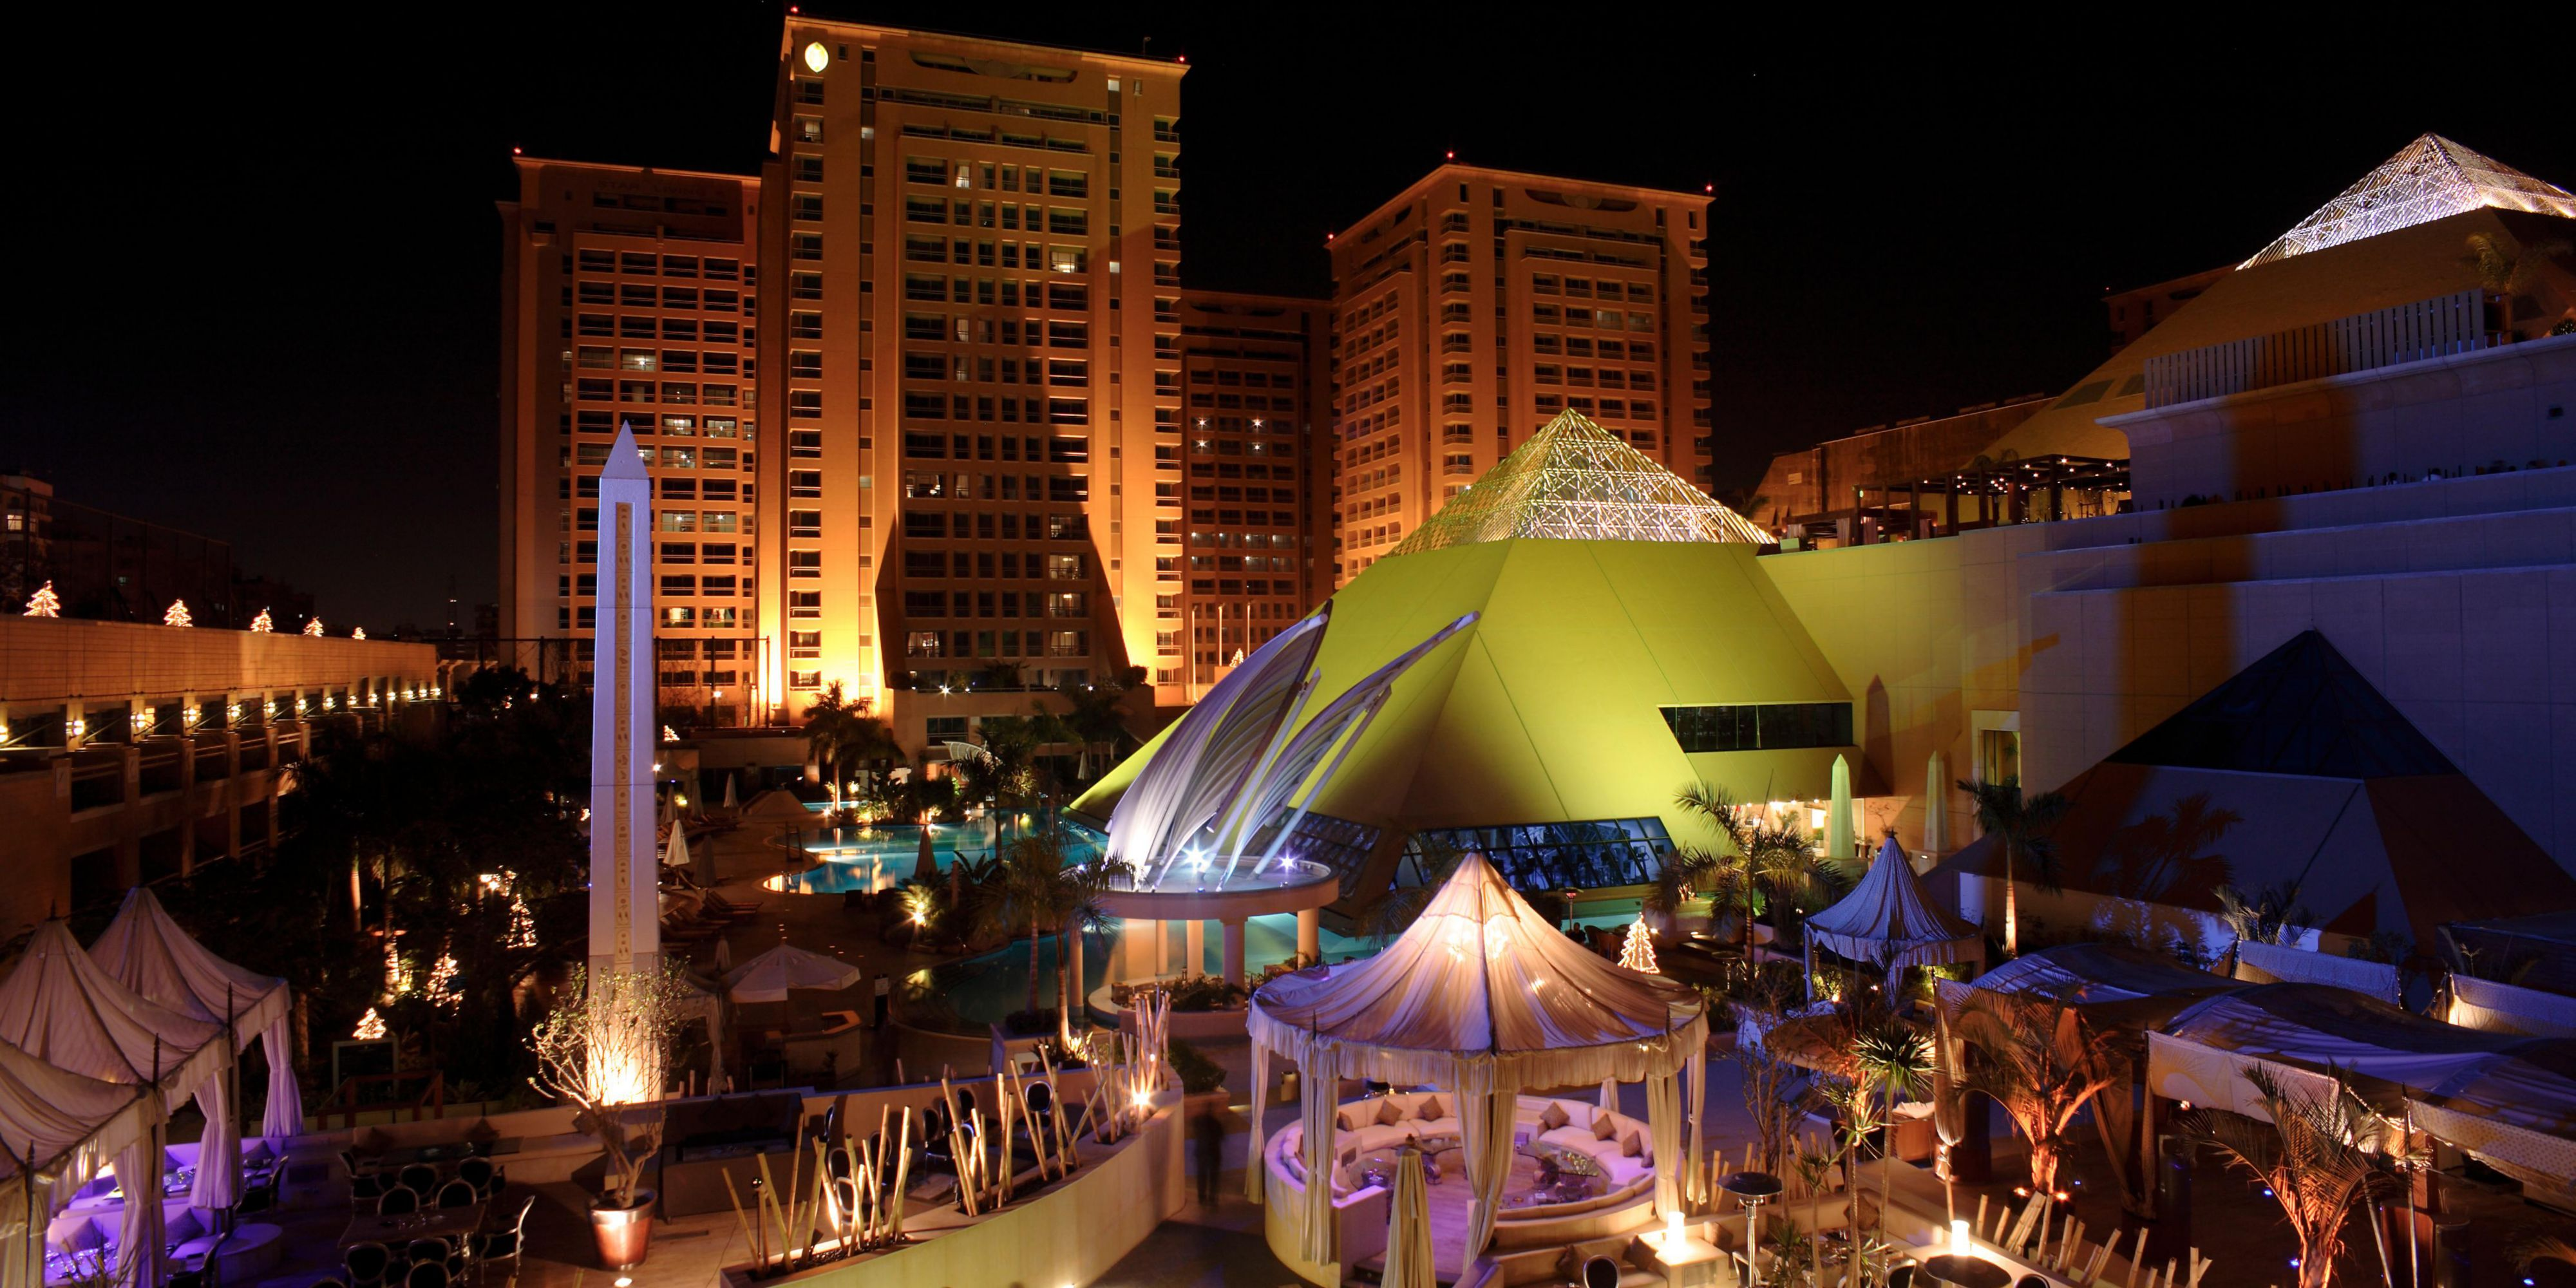 Hotels in Egypt 4 stars